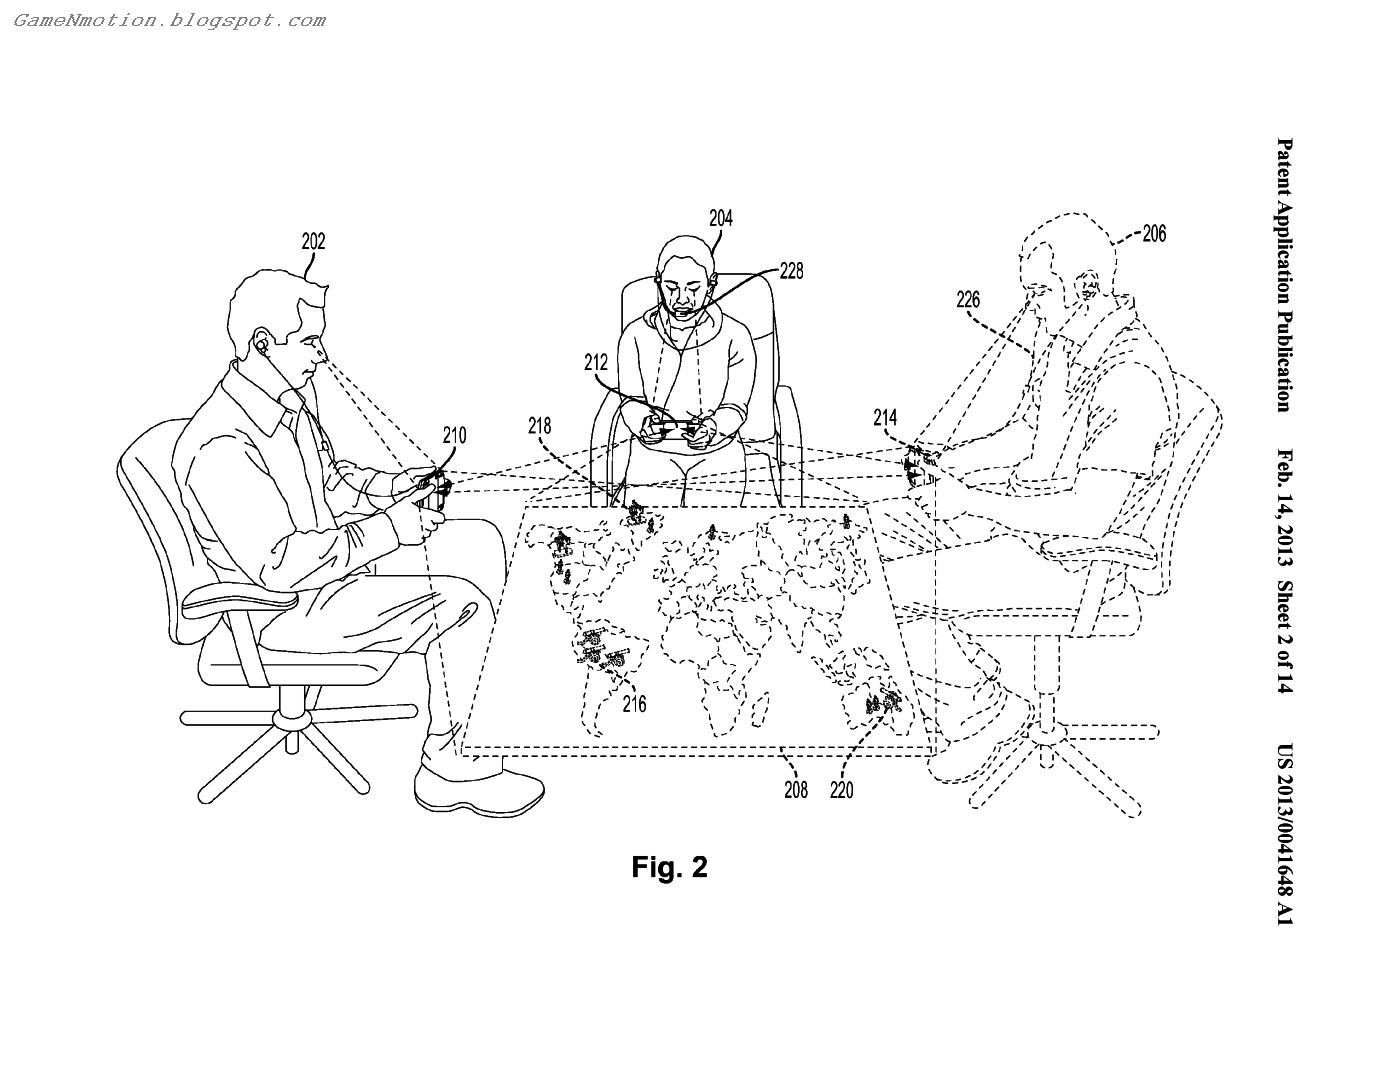 Game'N'Motion: PlayStation 4 Controller's Speaker